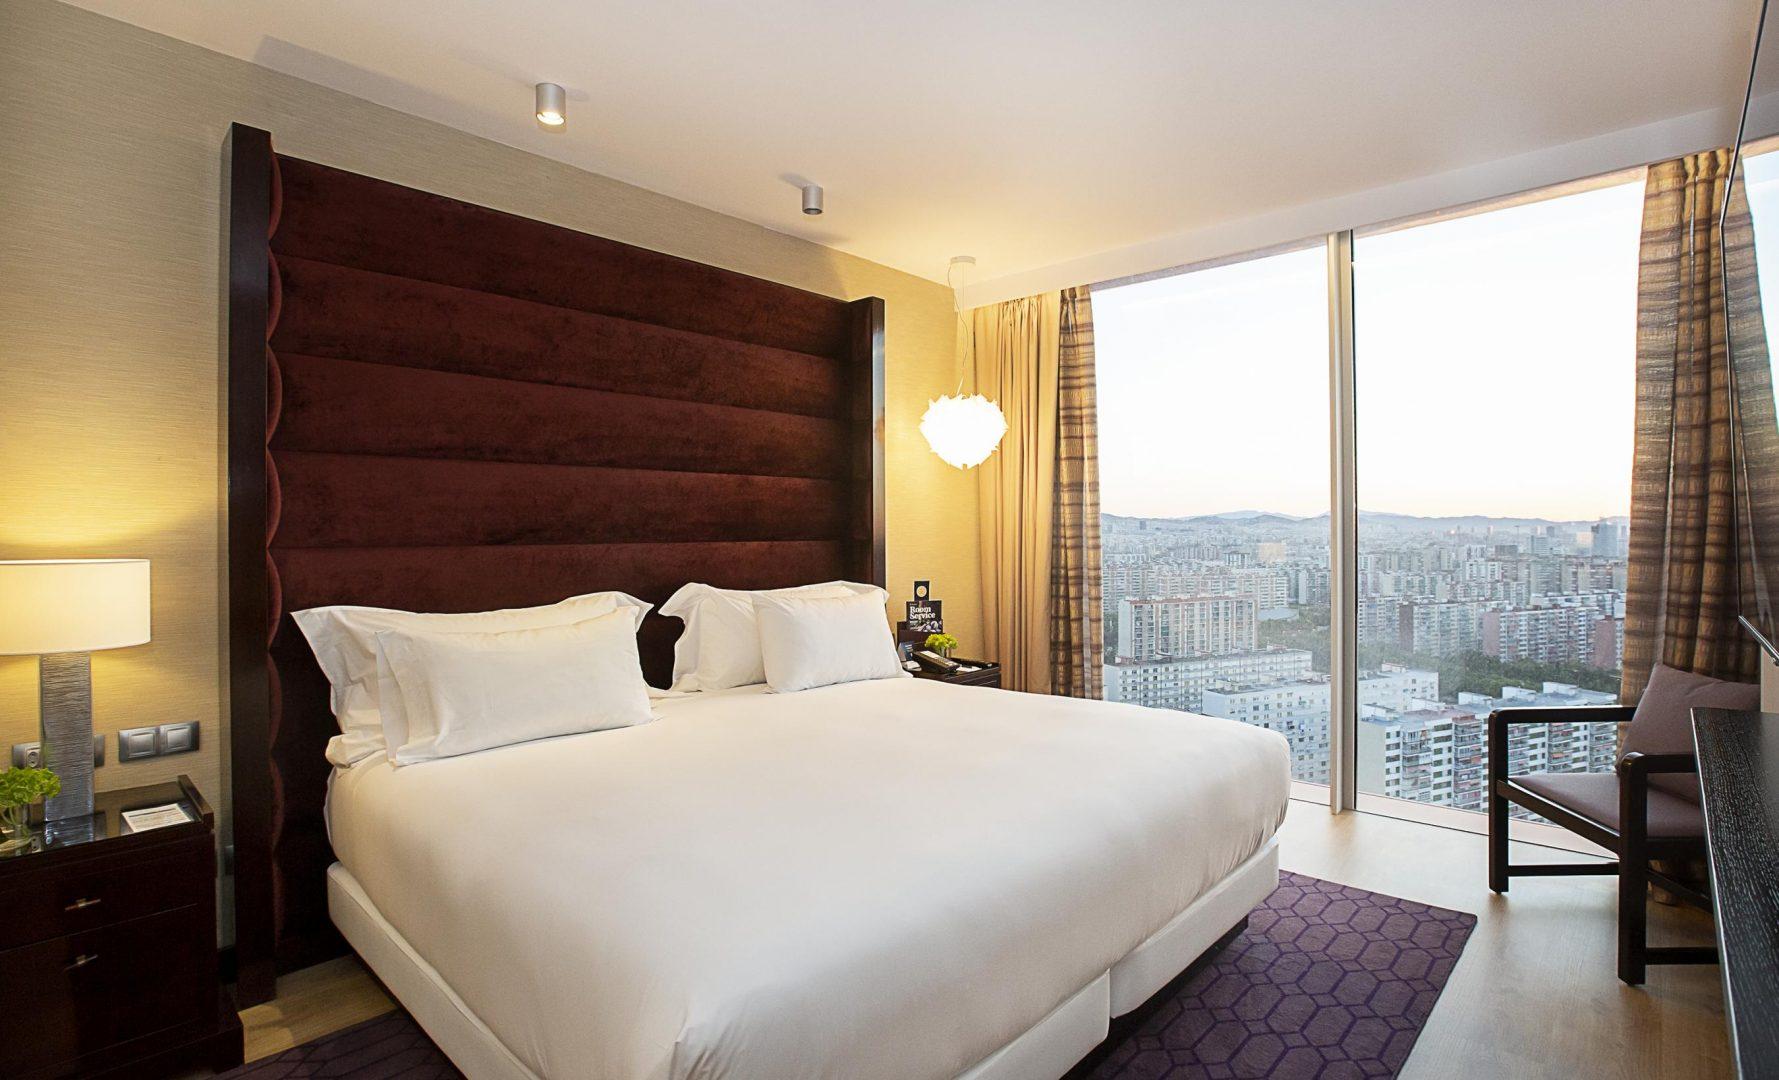 Executive Suite at Hyatt Regency Barcelona Tower